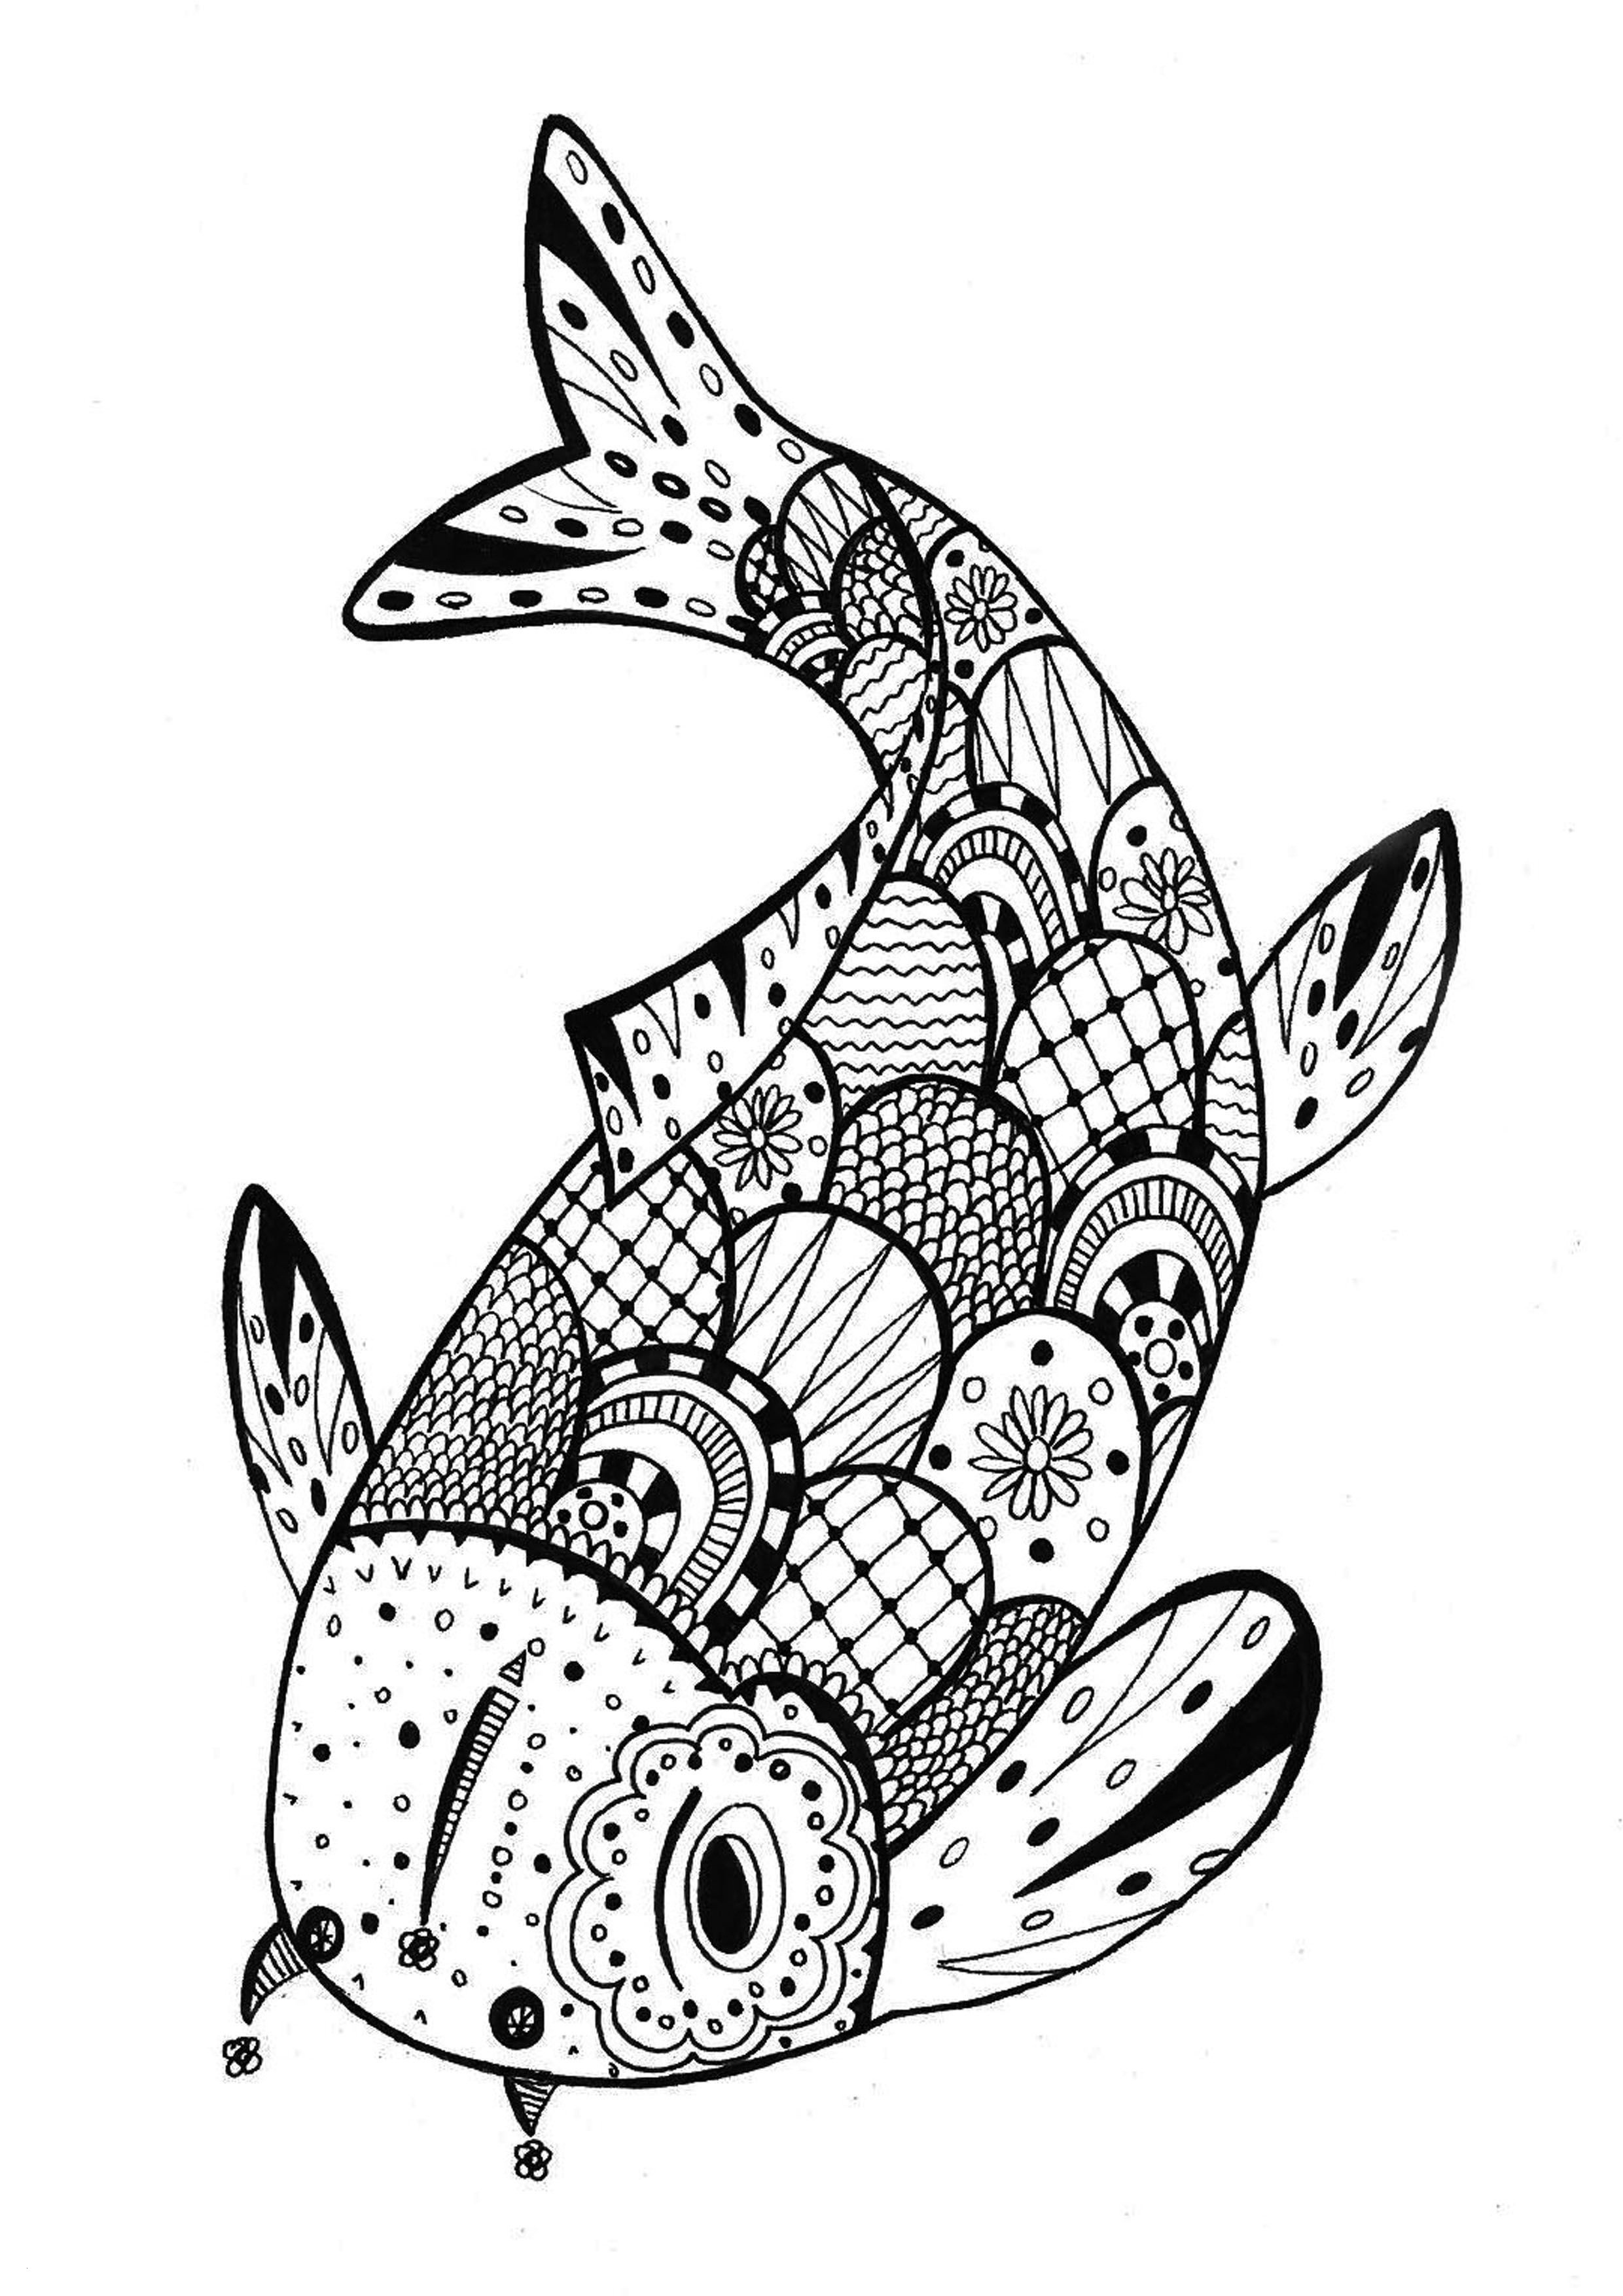 Dibujos De Pez Koi Mandala Para Colorear Pintar E Imprimir